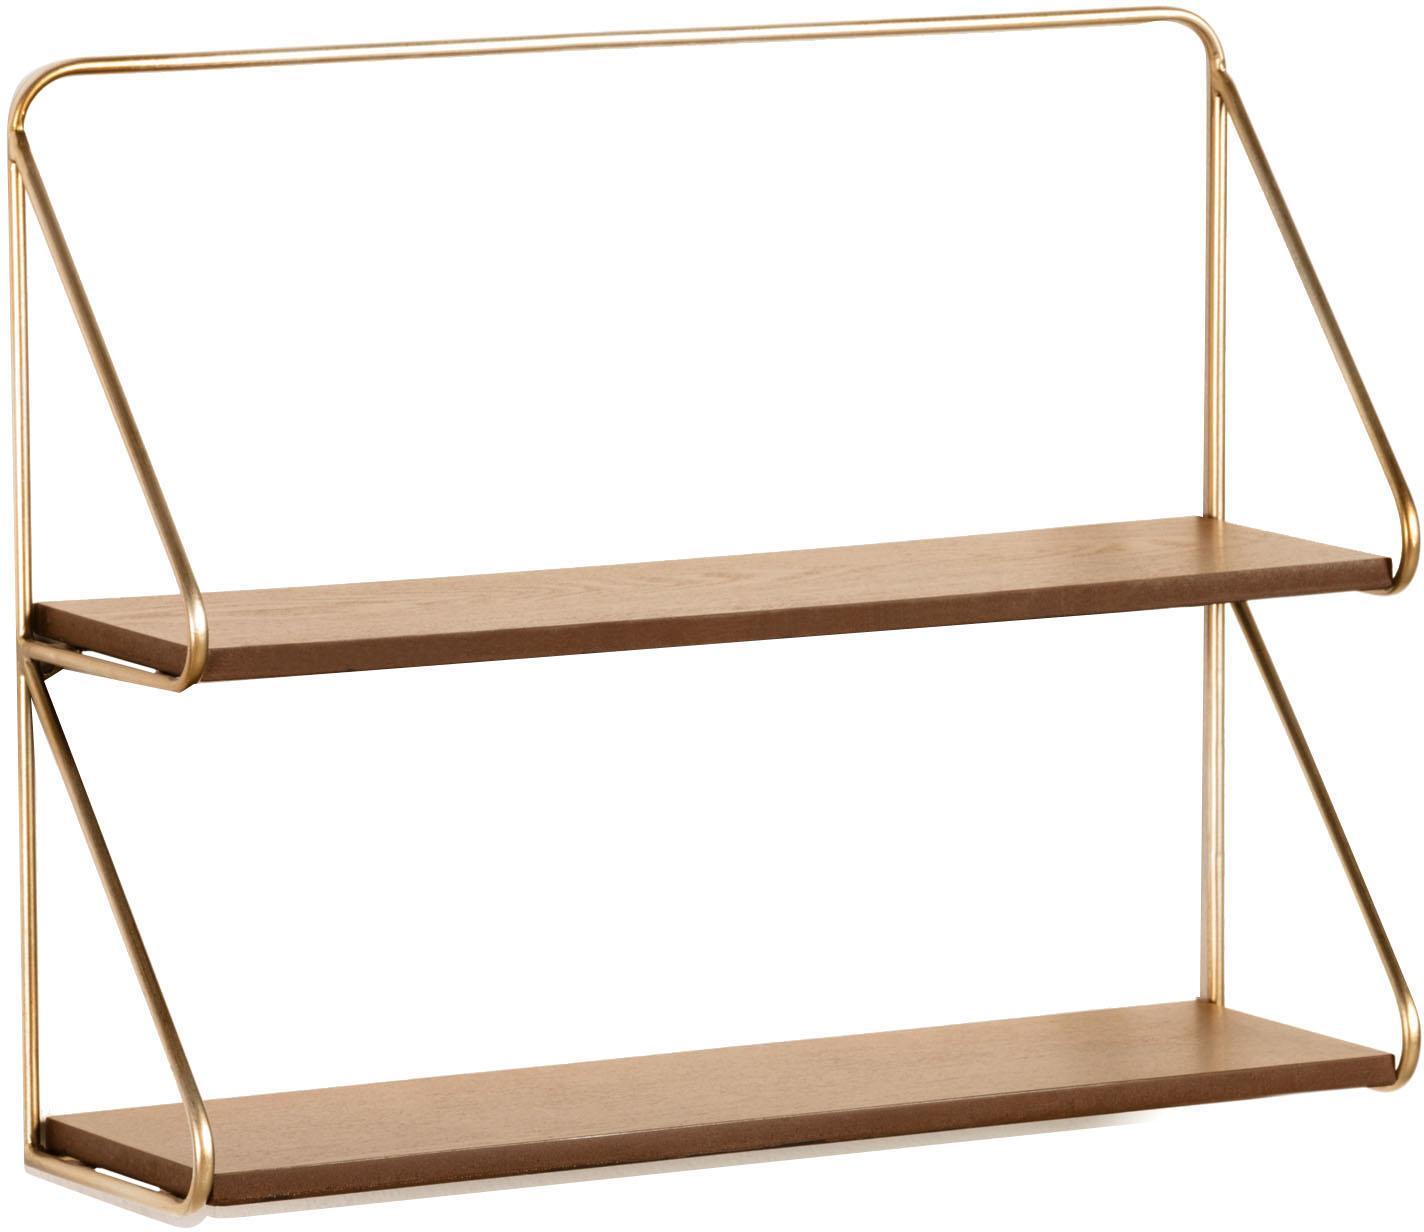 Klein wandrek Catrina, Frame: gelakt metaal, Bruin, goudkleurig, 51 x 42 cm